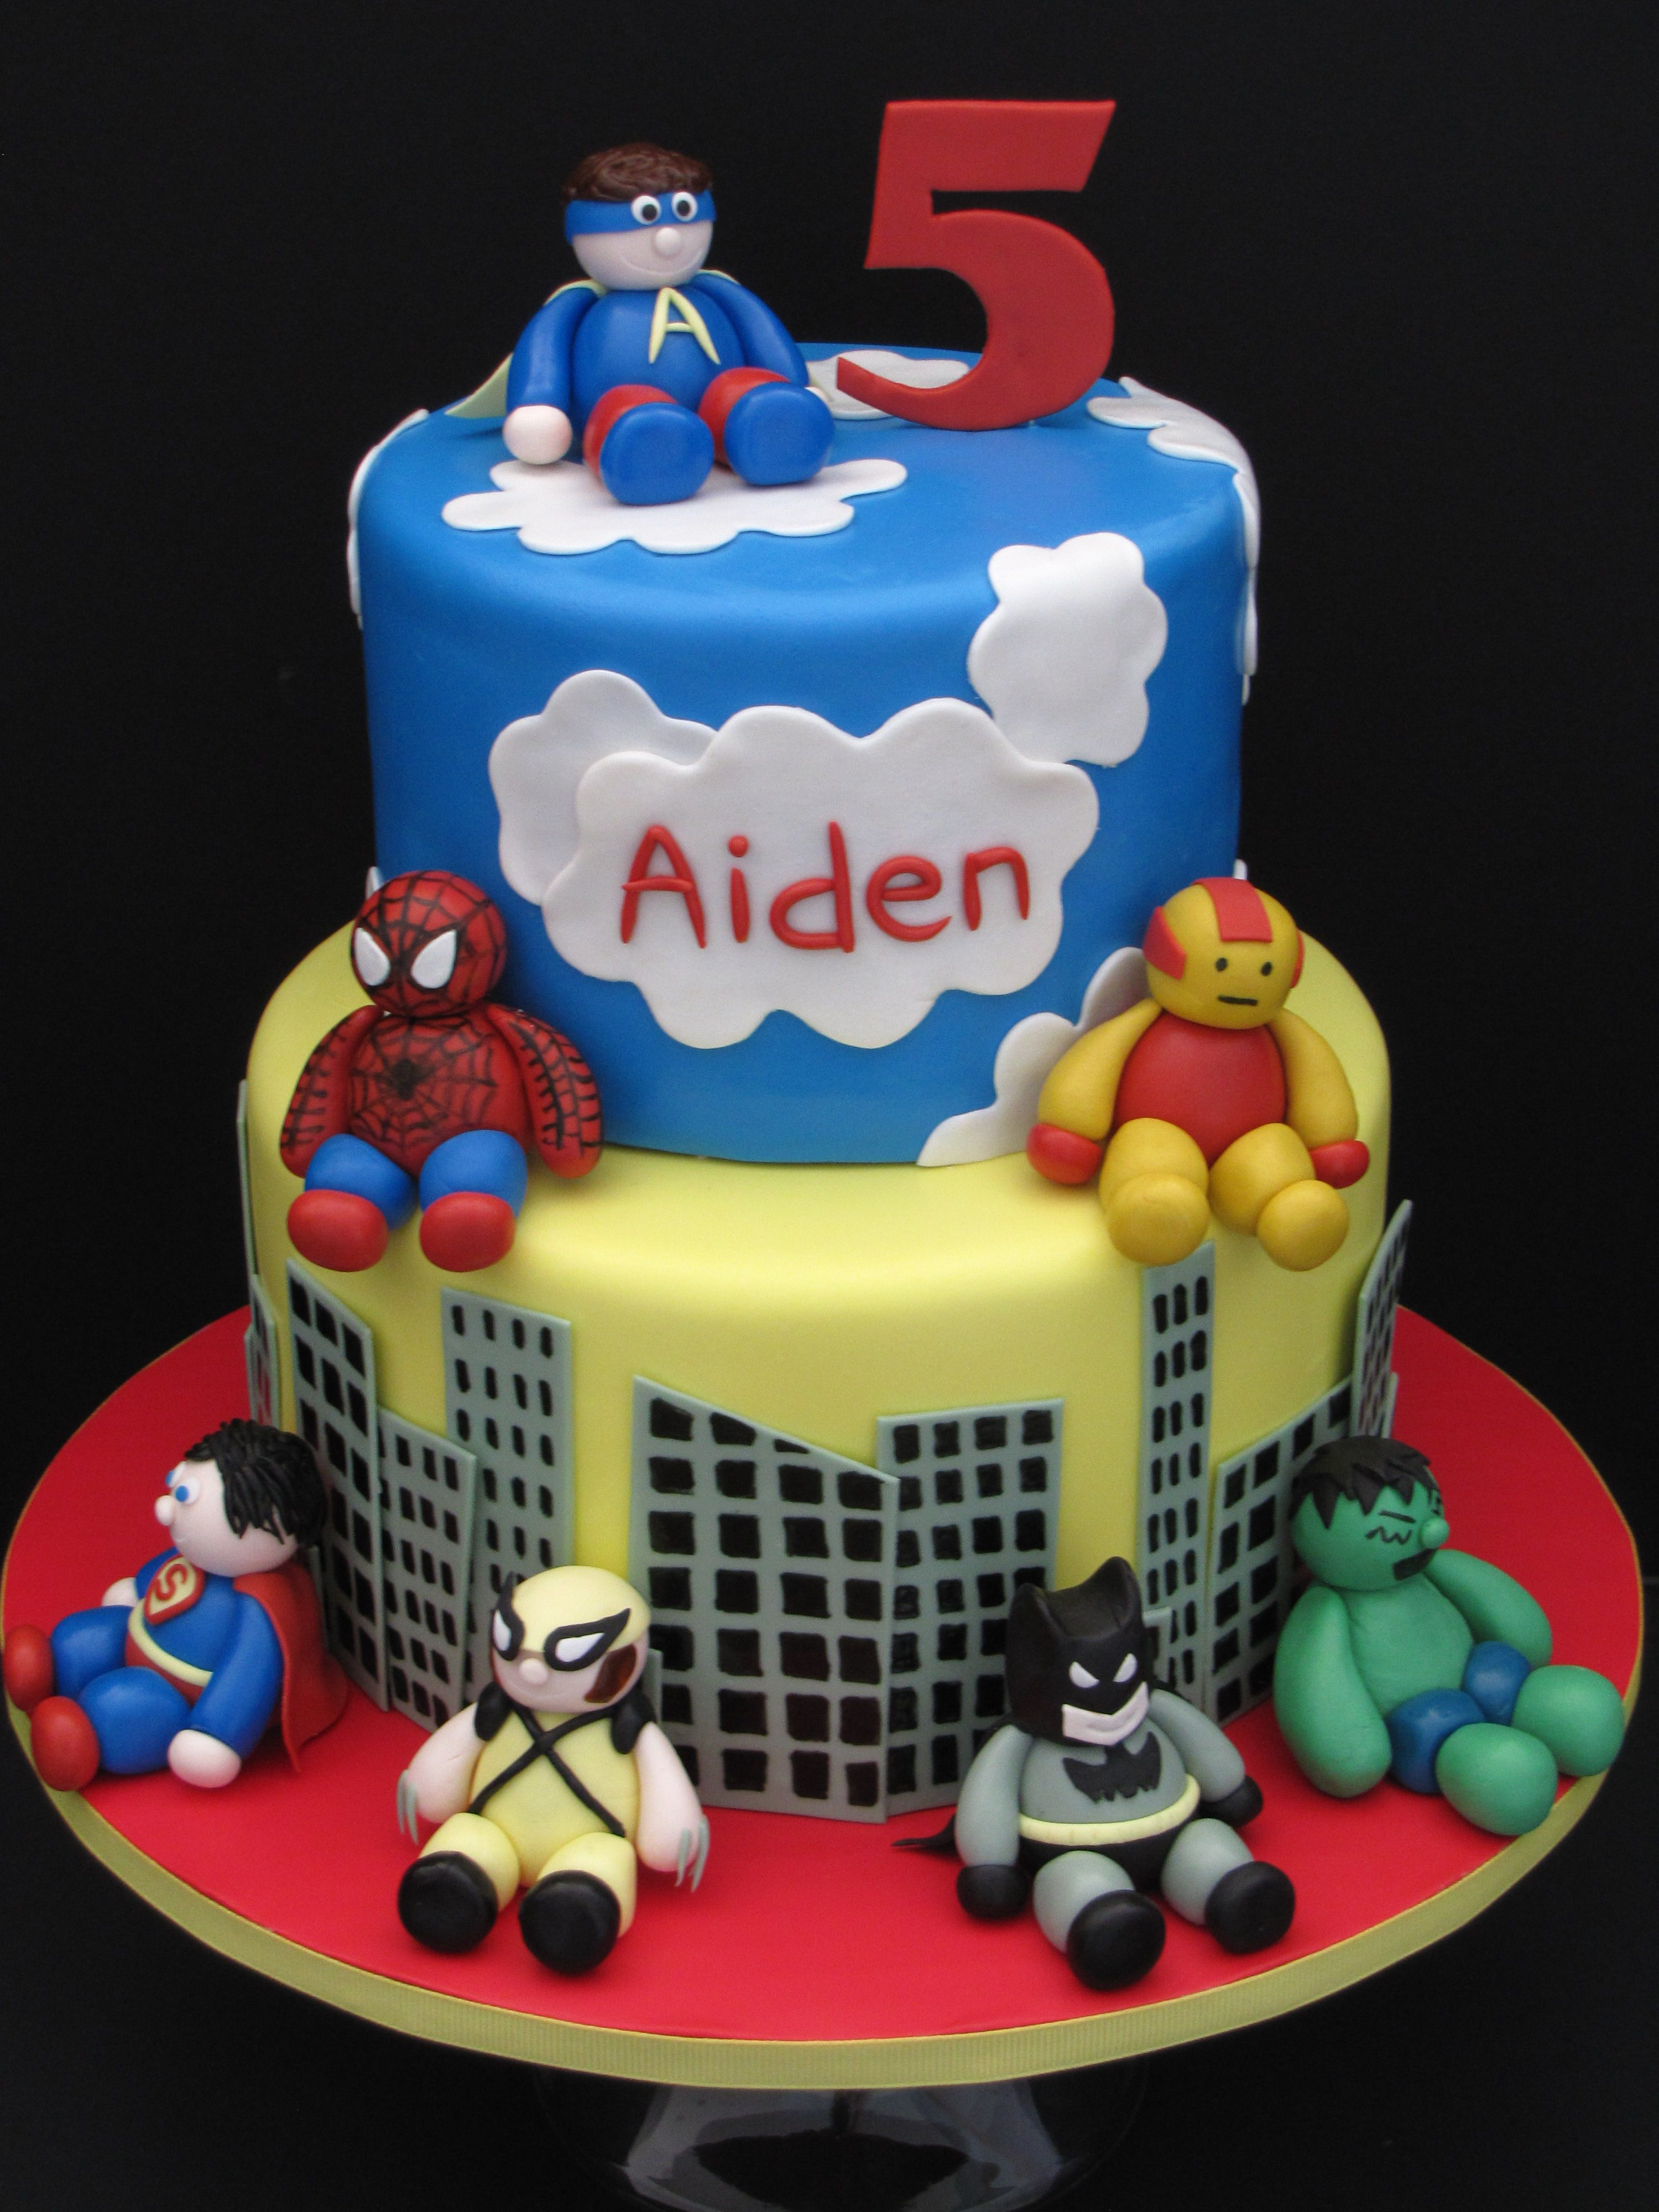 Superhero Birthday Cake This birthday cake was for a